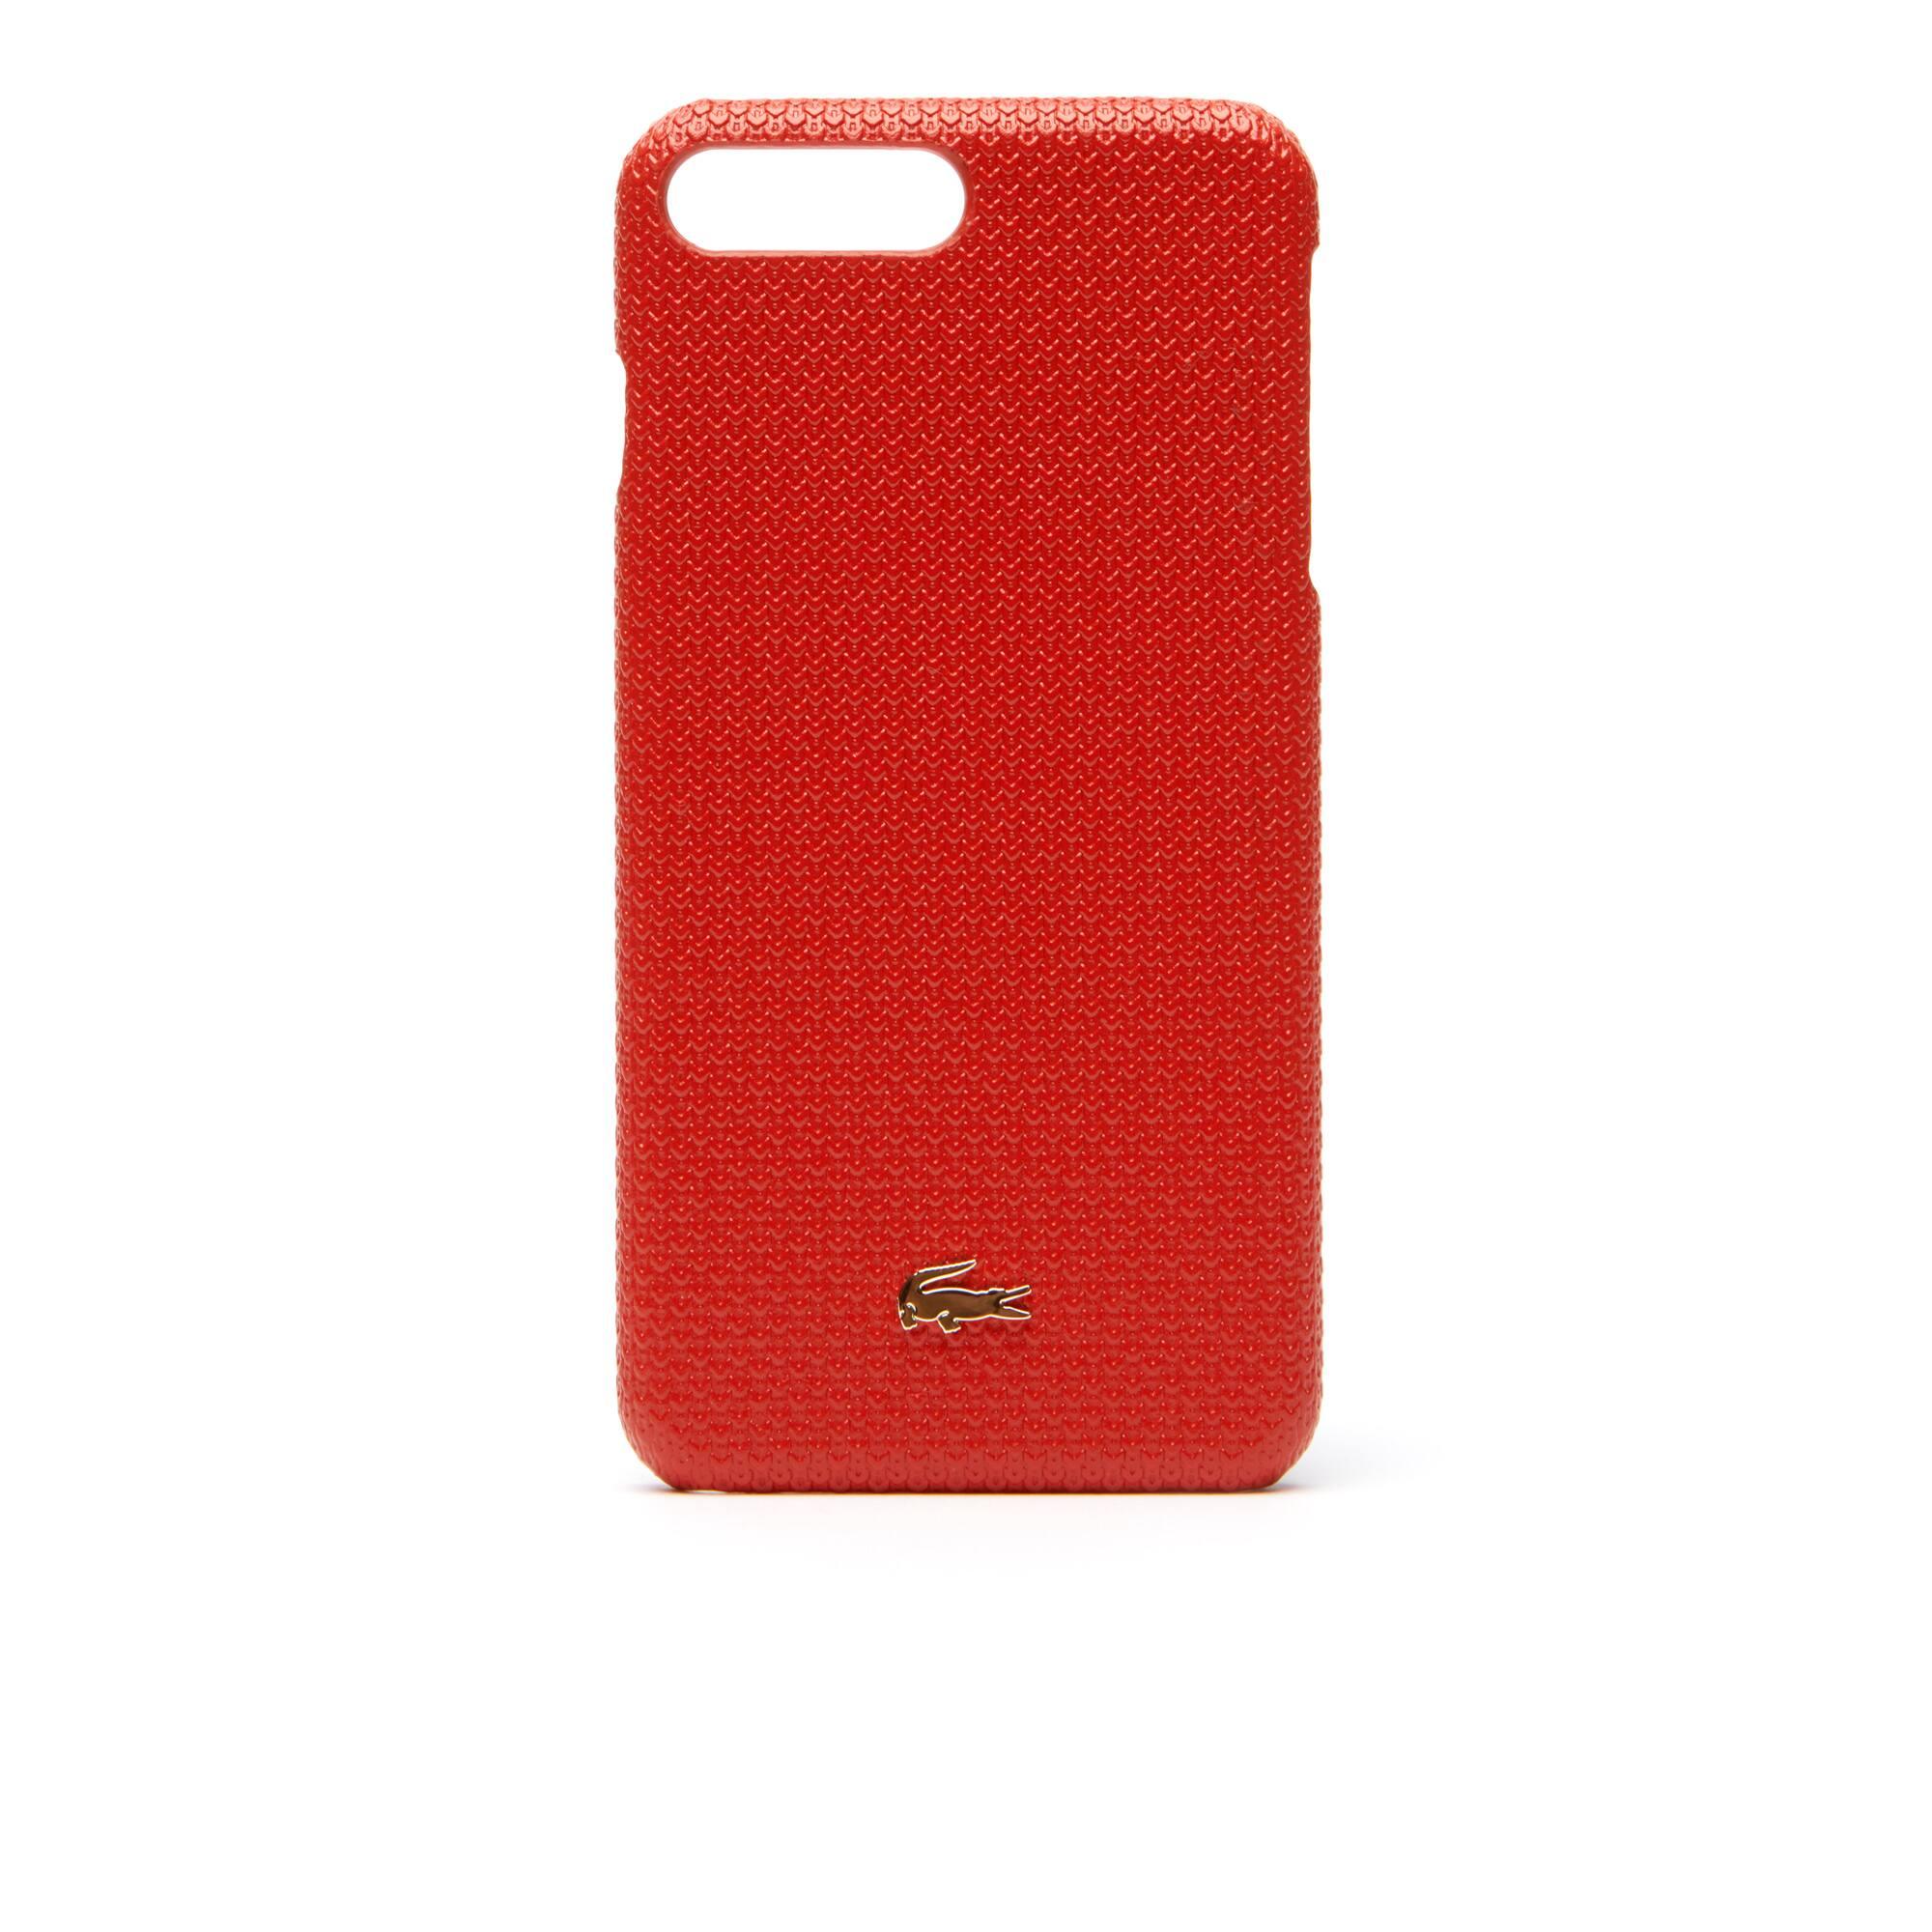 Women's Chantaco Piqué Leather iPhone 8+ Shell